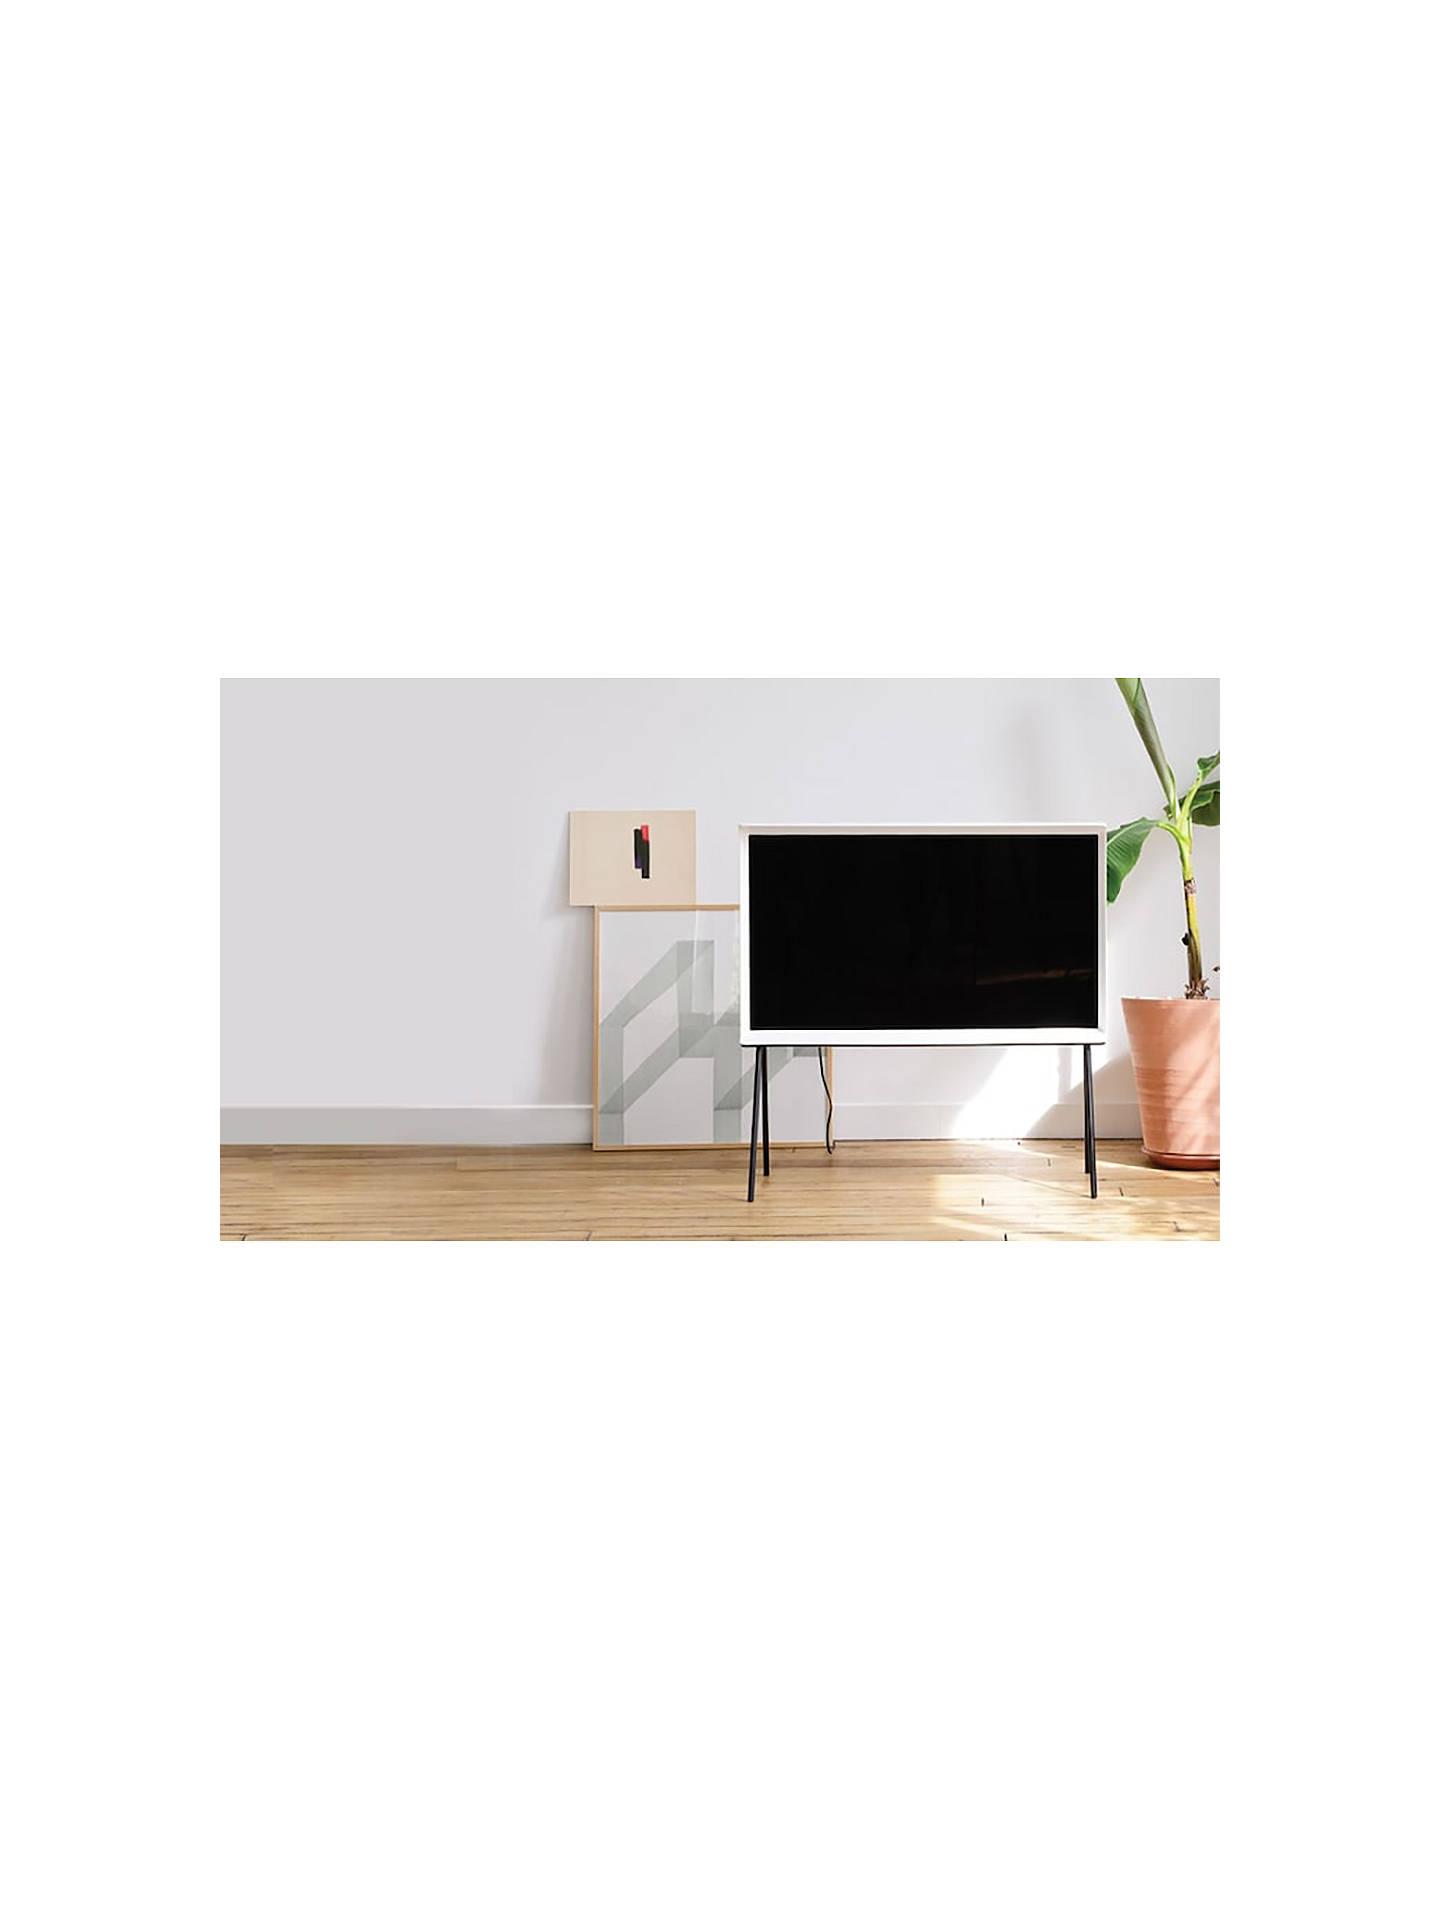 Samsung The Serif (2019) QLED HDR 4K Ultra HD Smart TV, 43